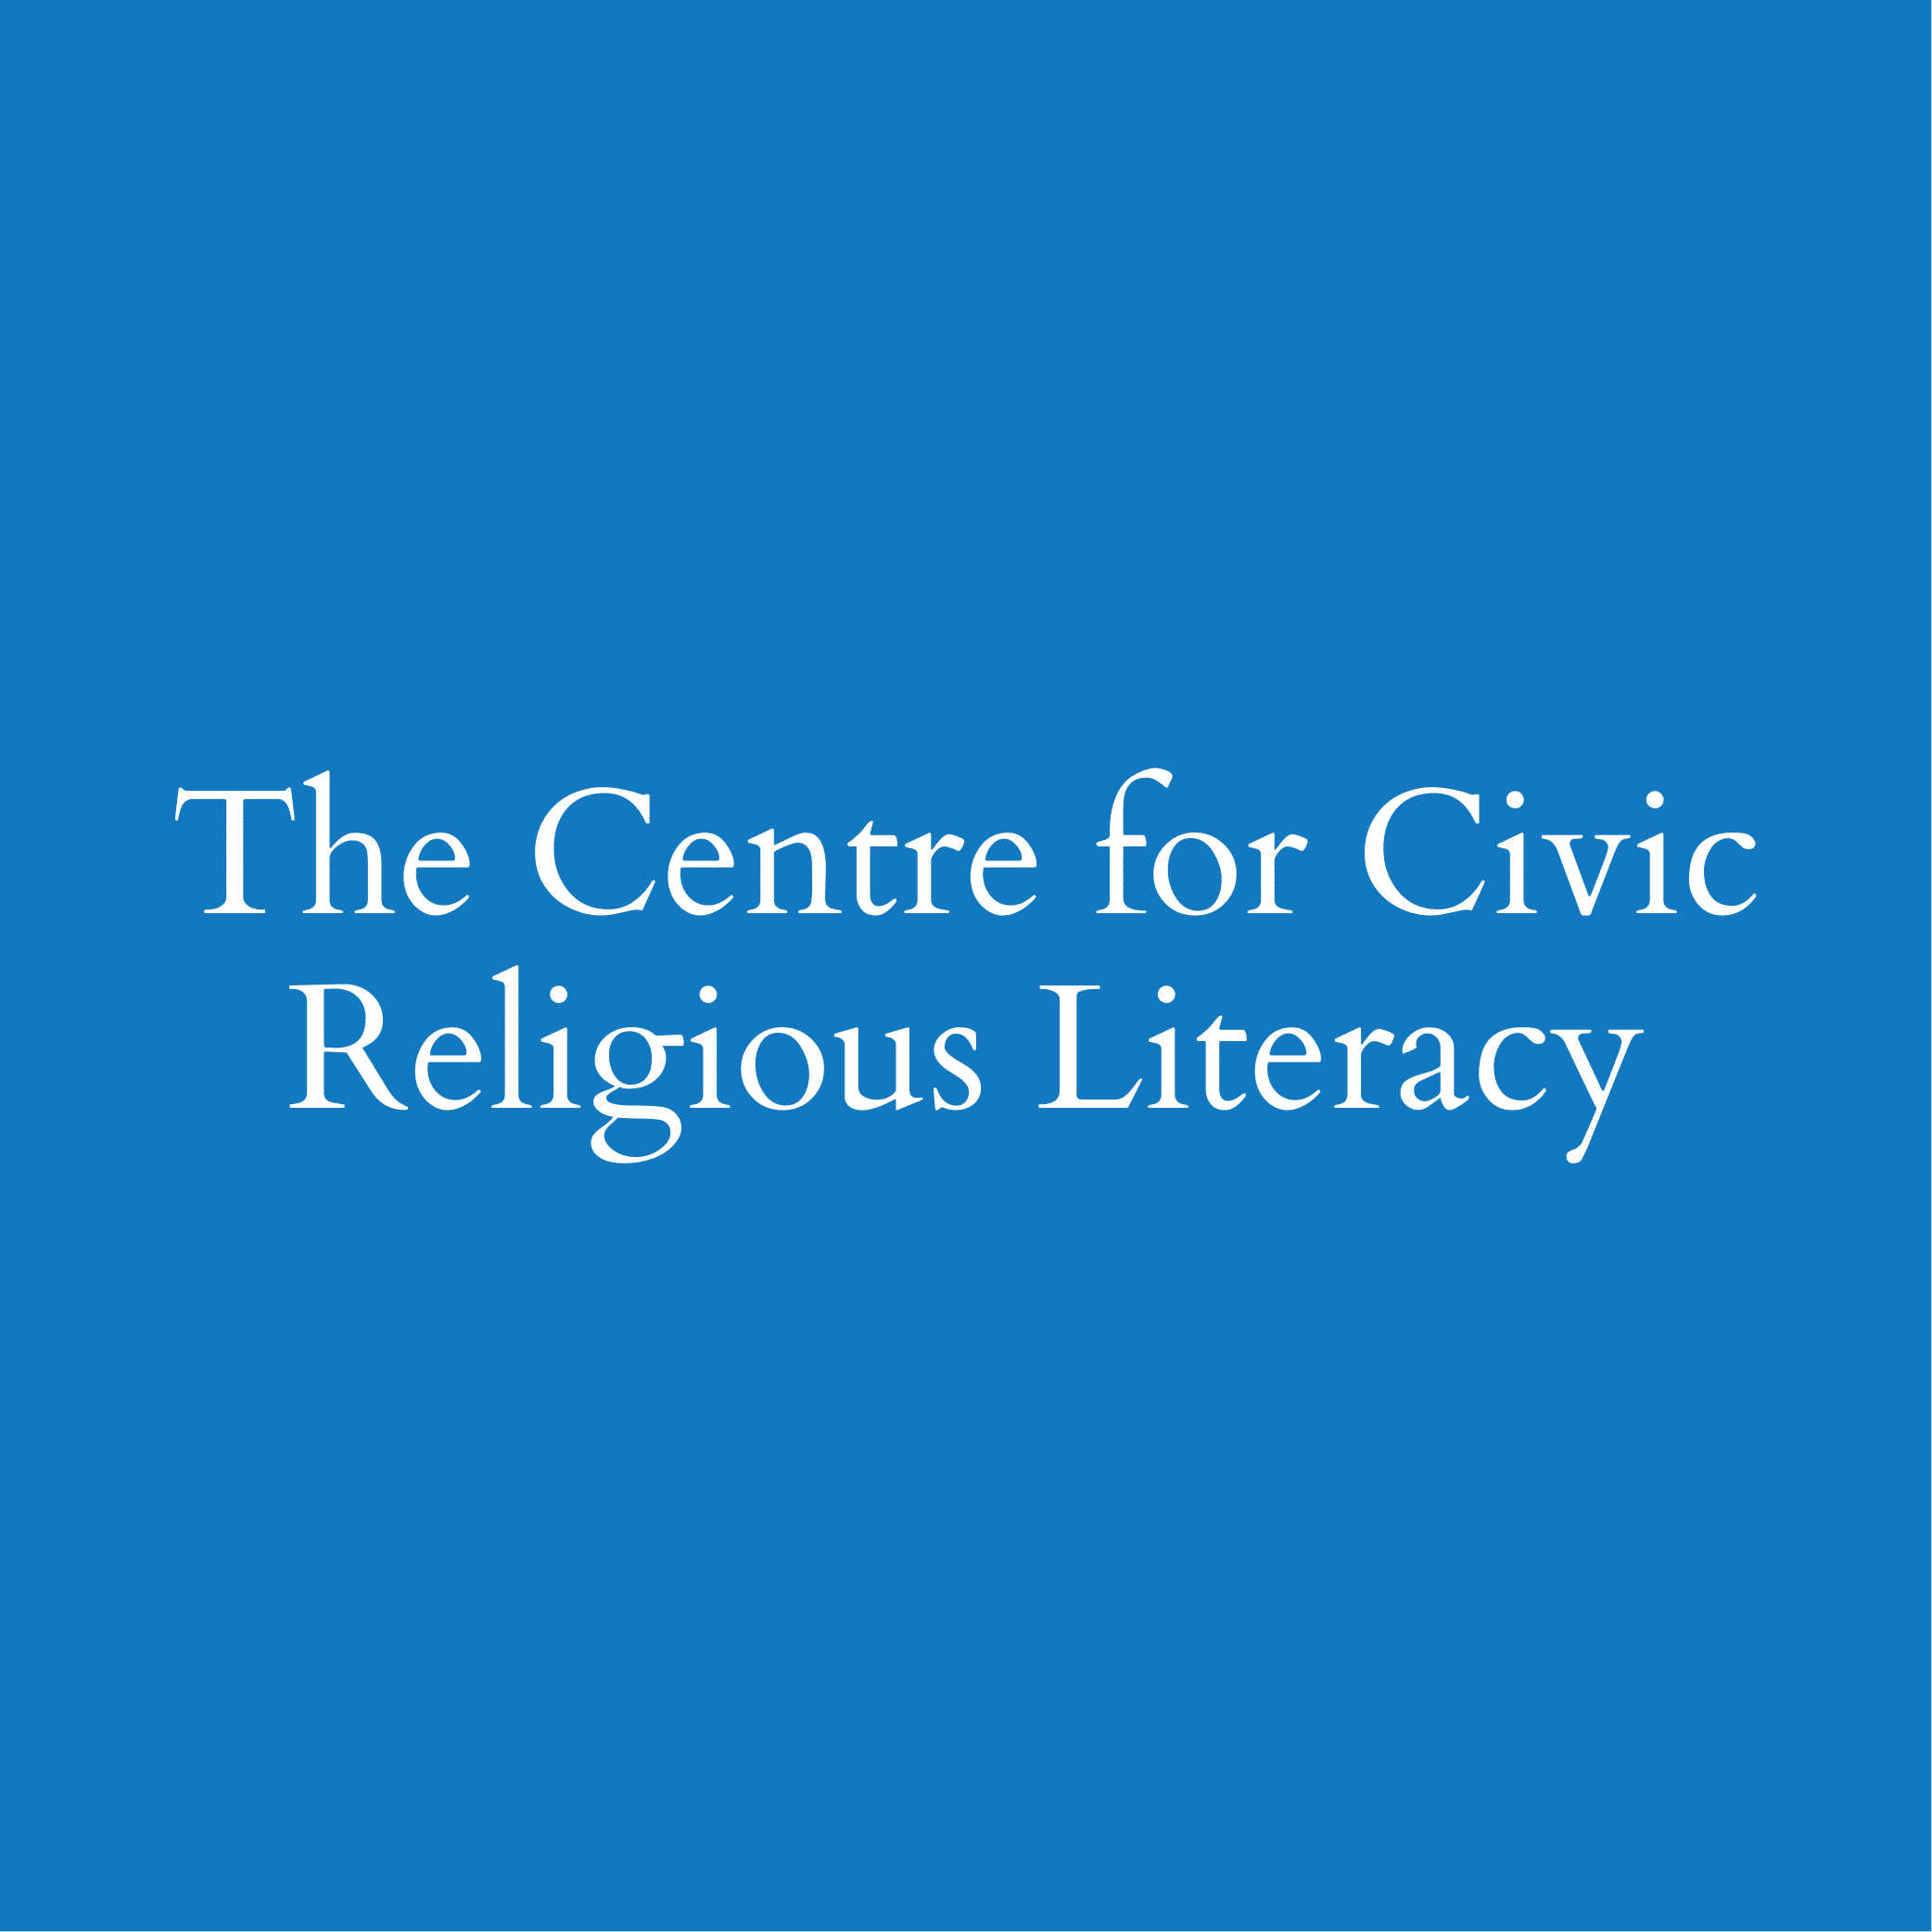 CCRL-blue-logo